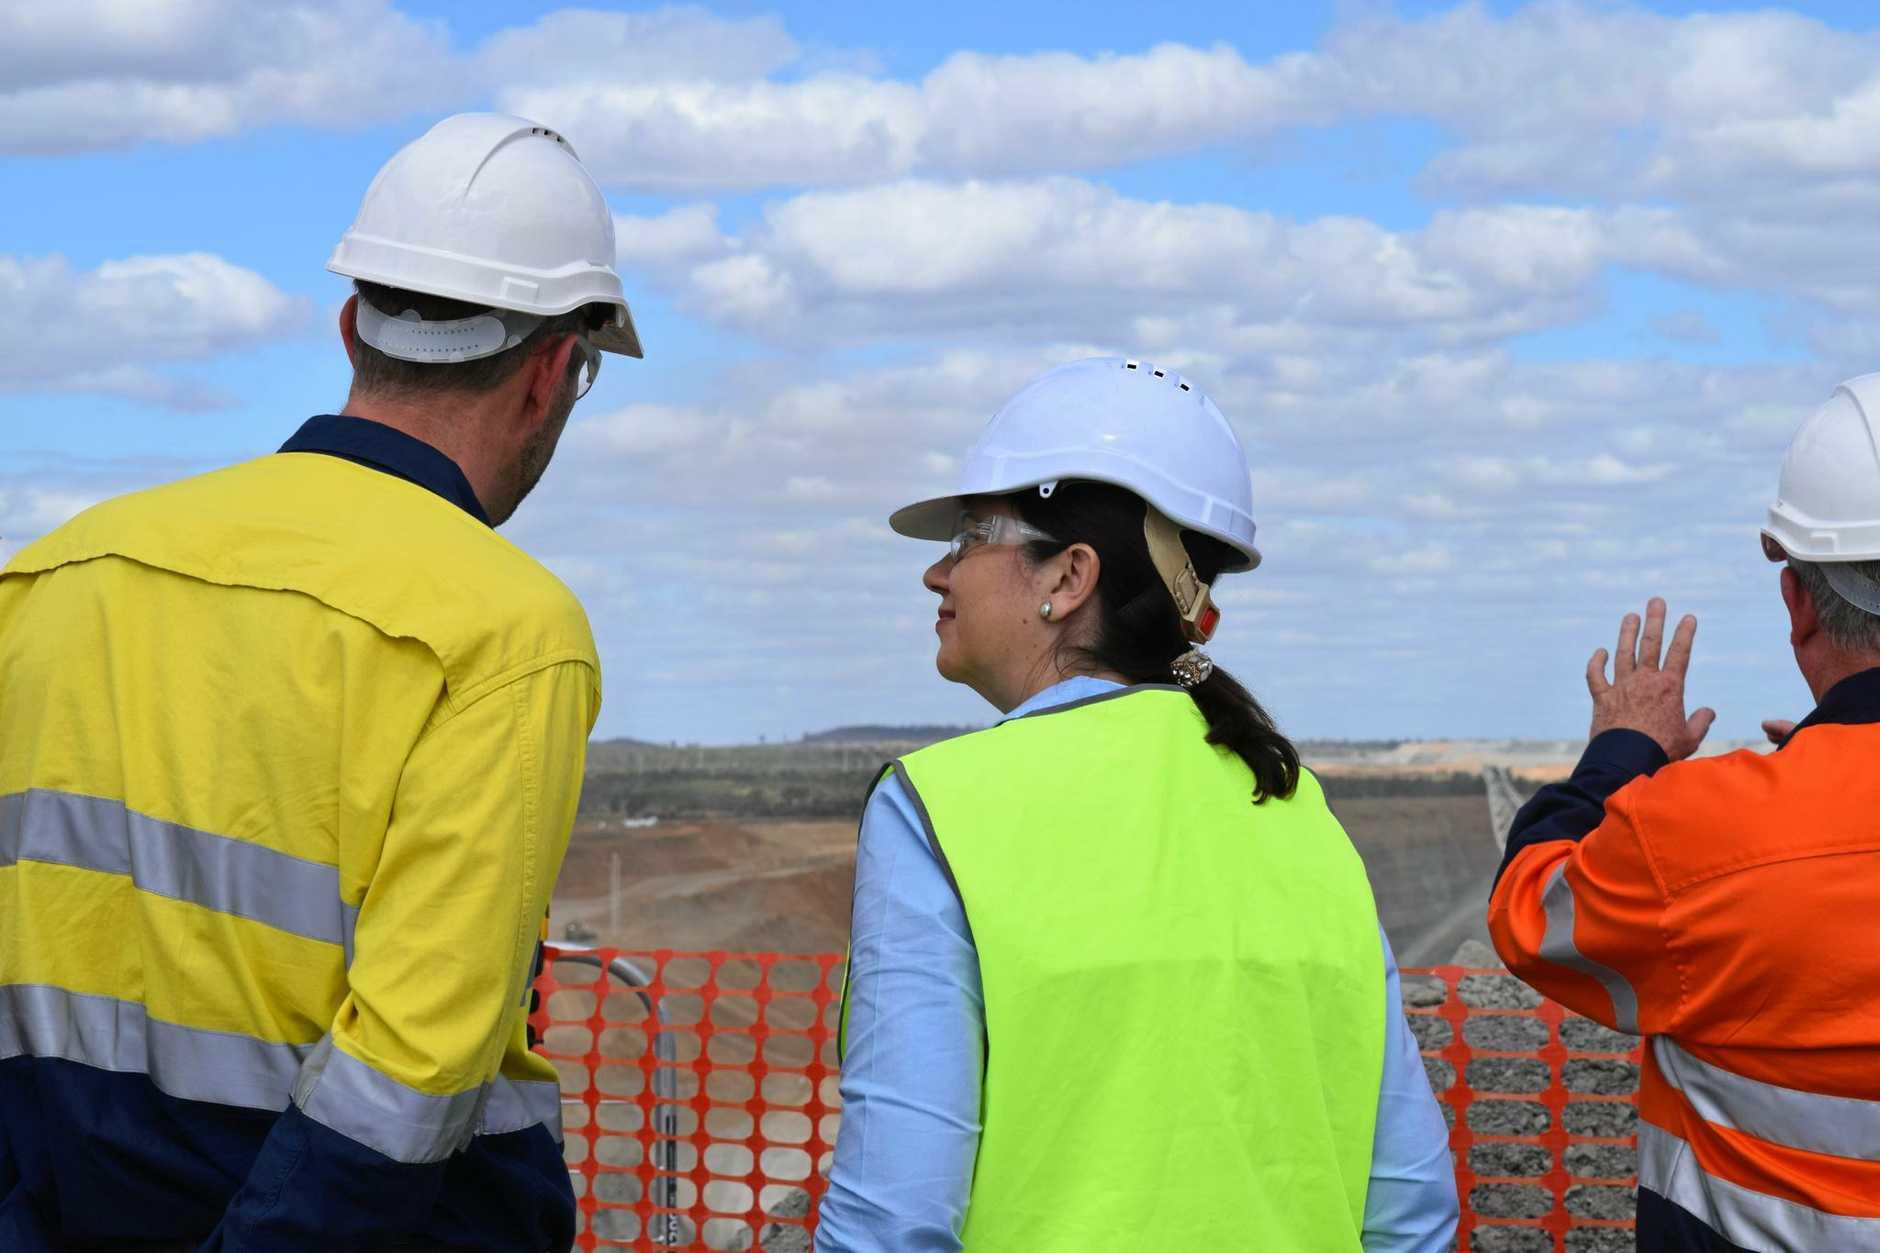 Managing director Nick Jorss explains the operation to Premier Annastacia Palaszczuk. Photo: Emily Smith